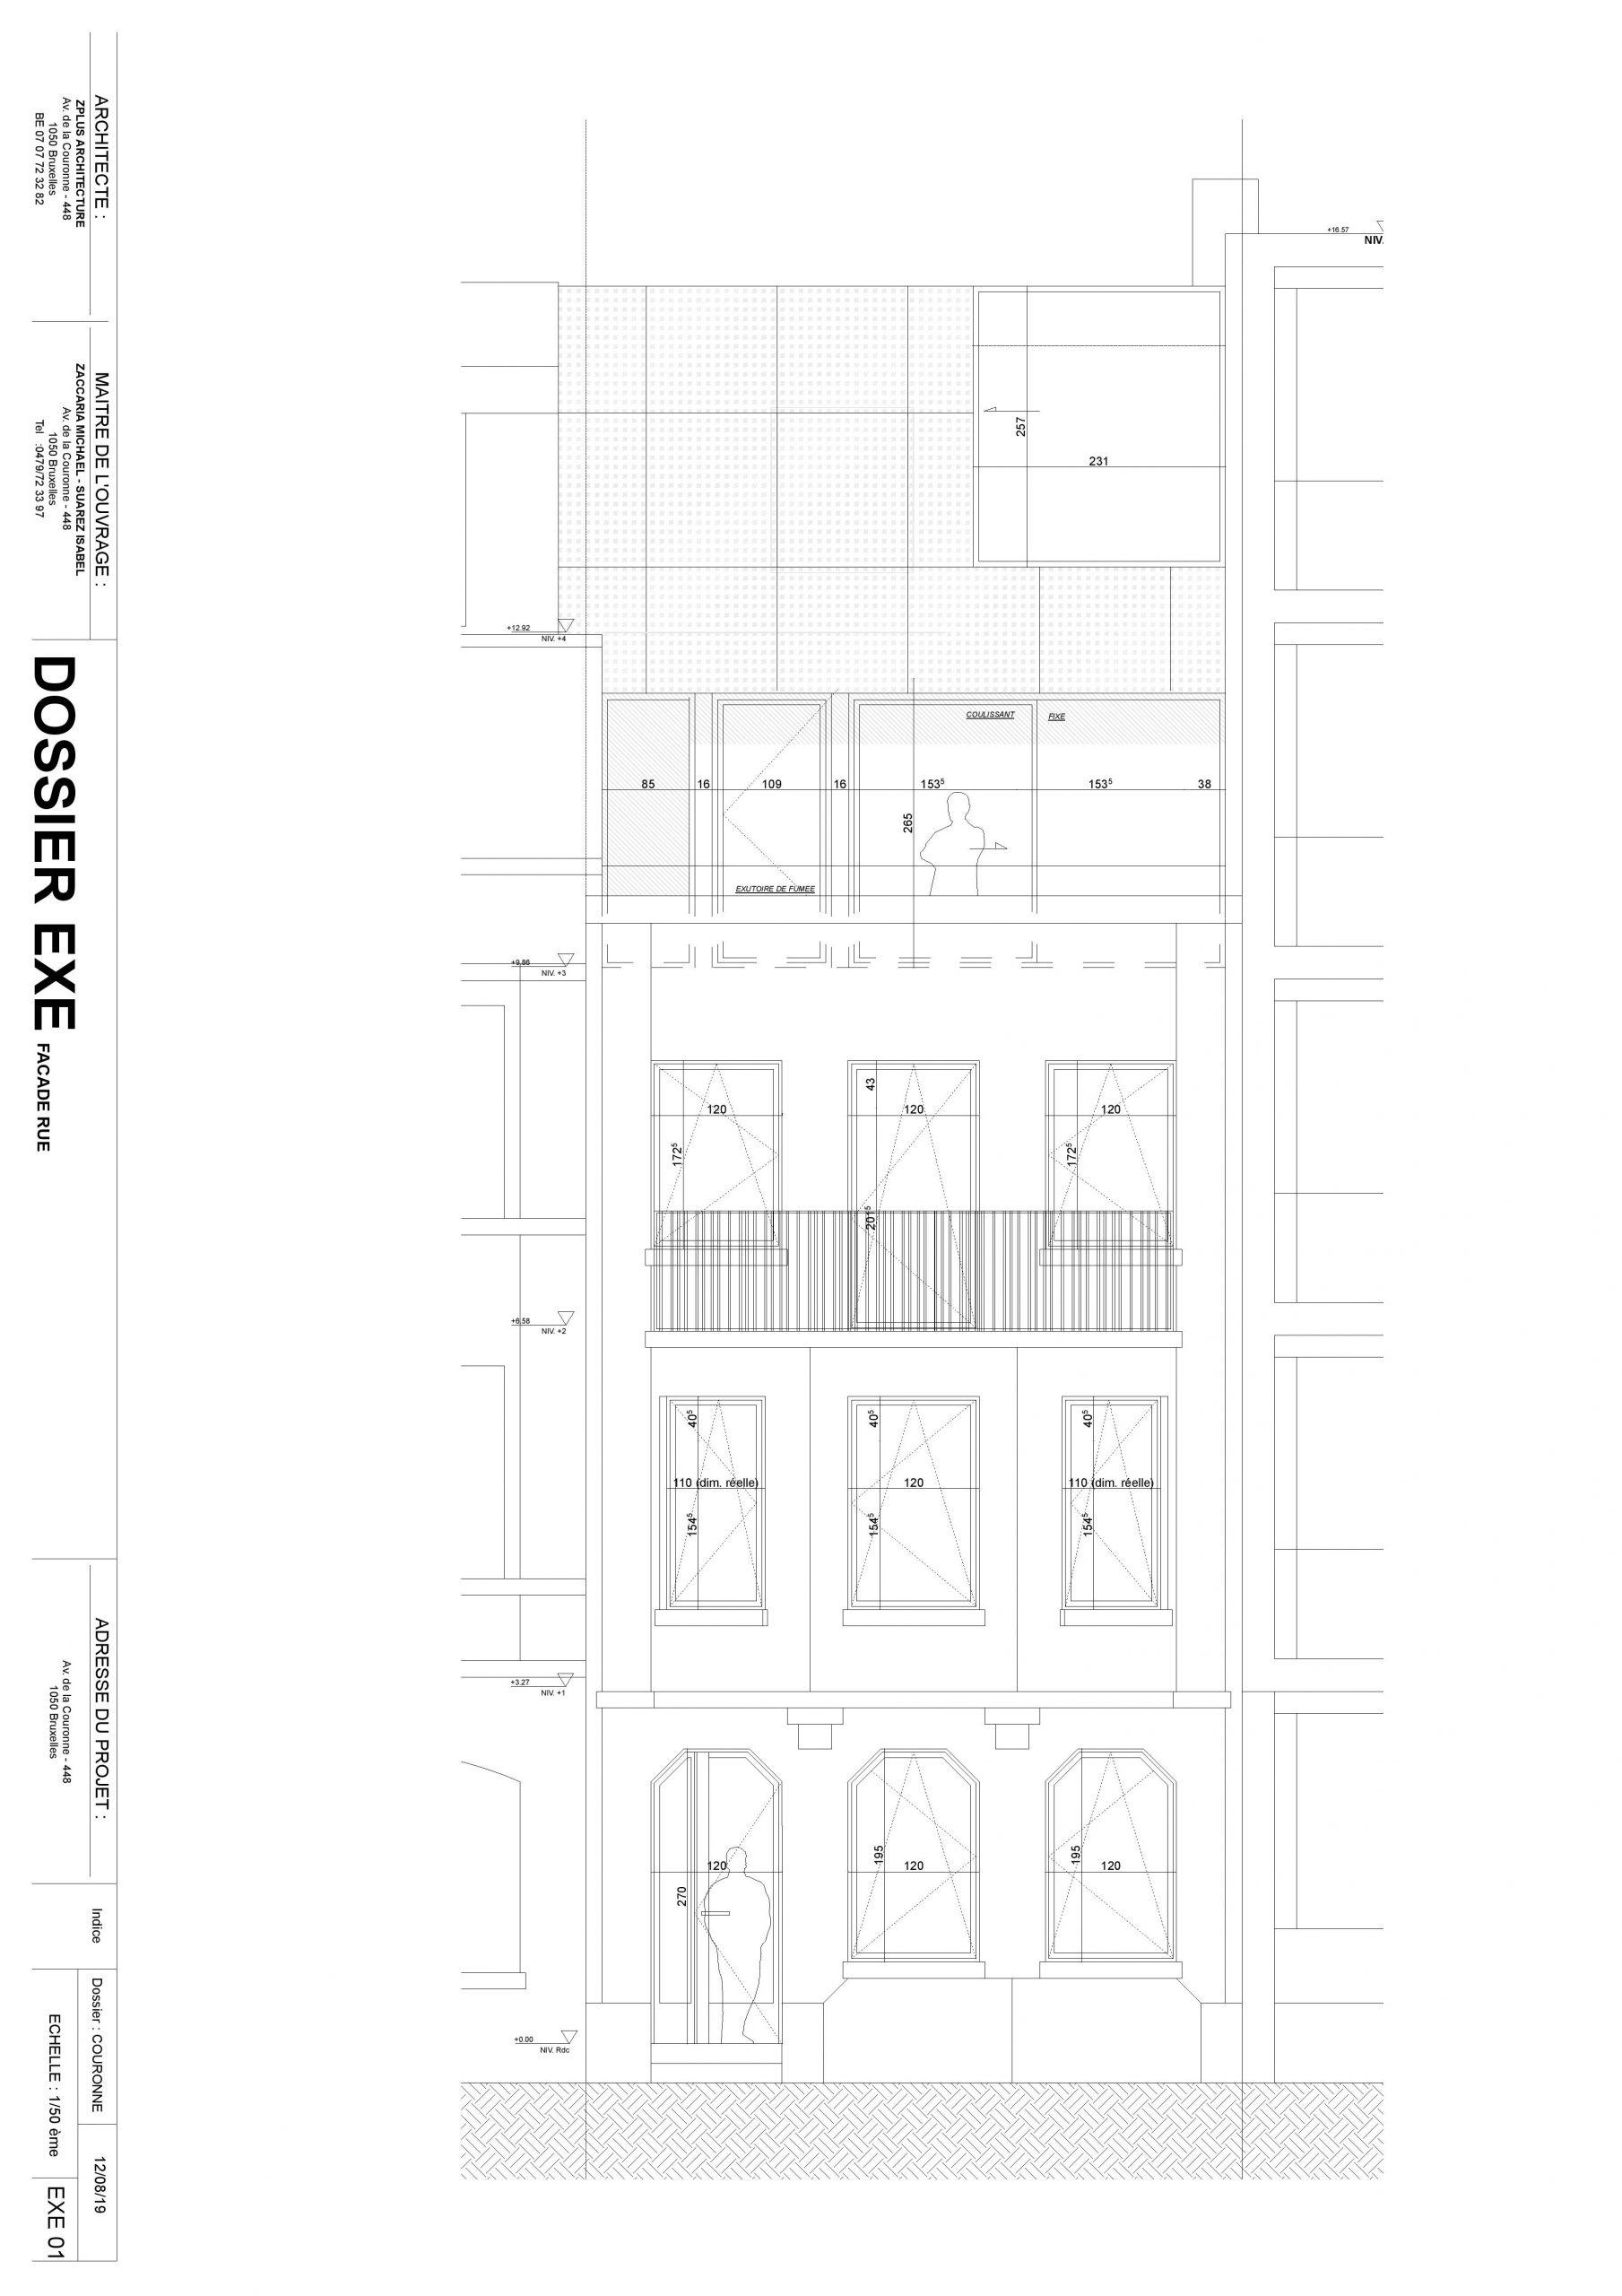 Dent creuse dossier plans urbanisme